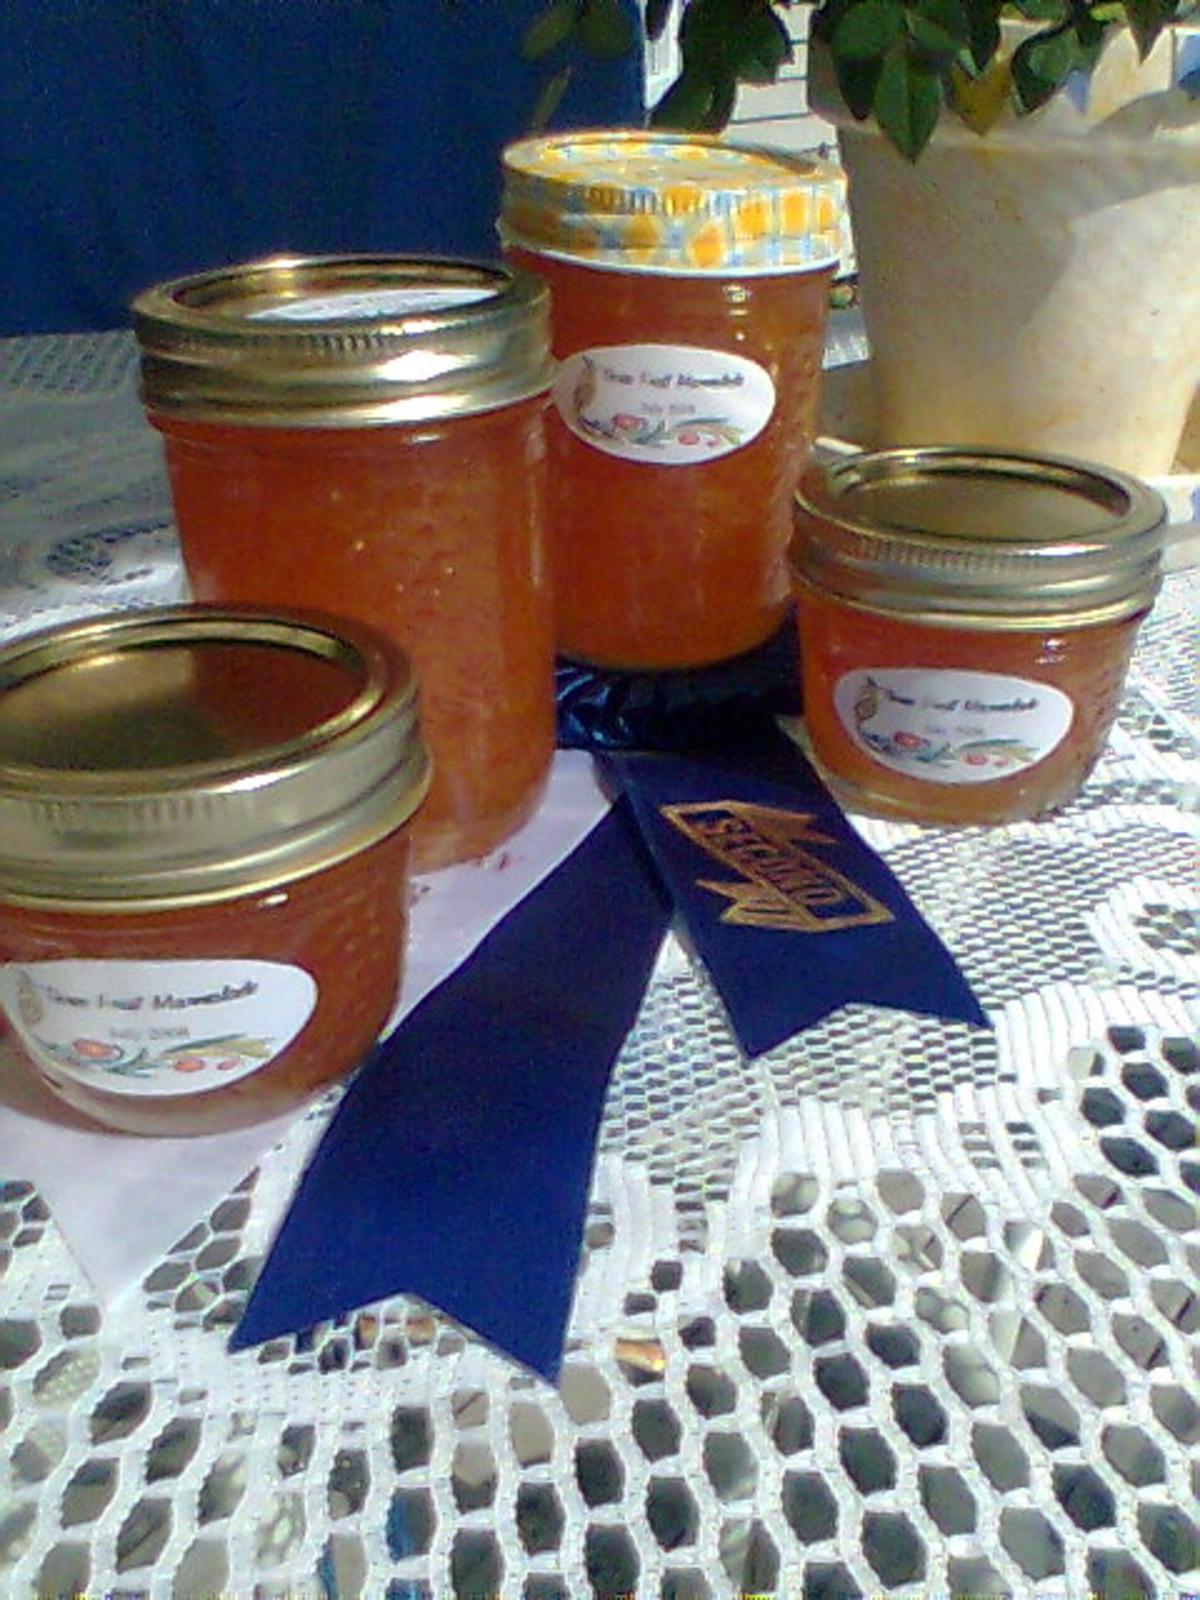 Norman's Golden Three-Fruit Marmalade image